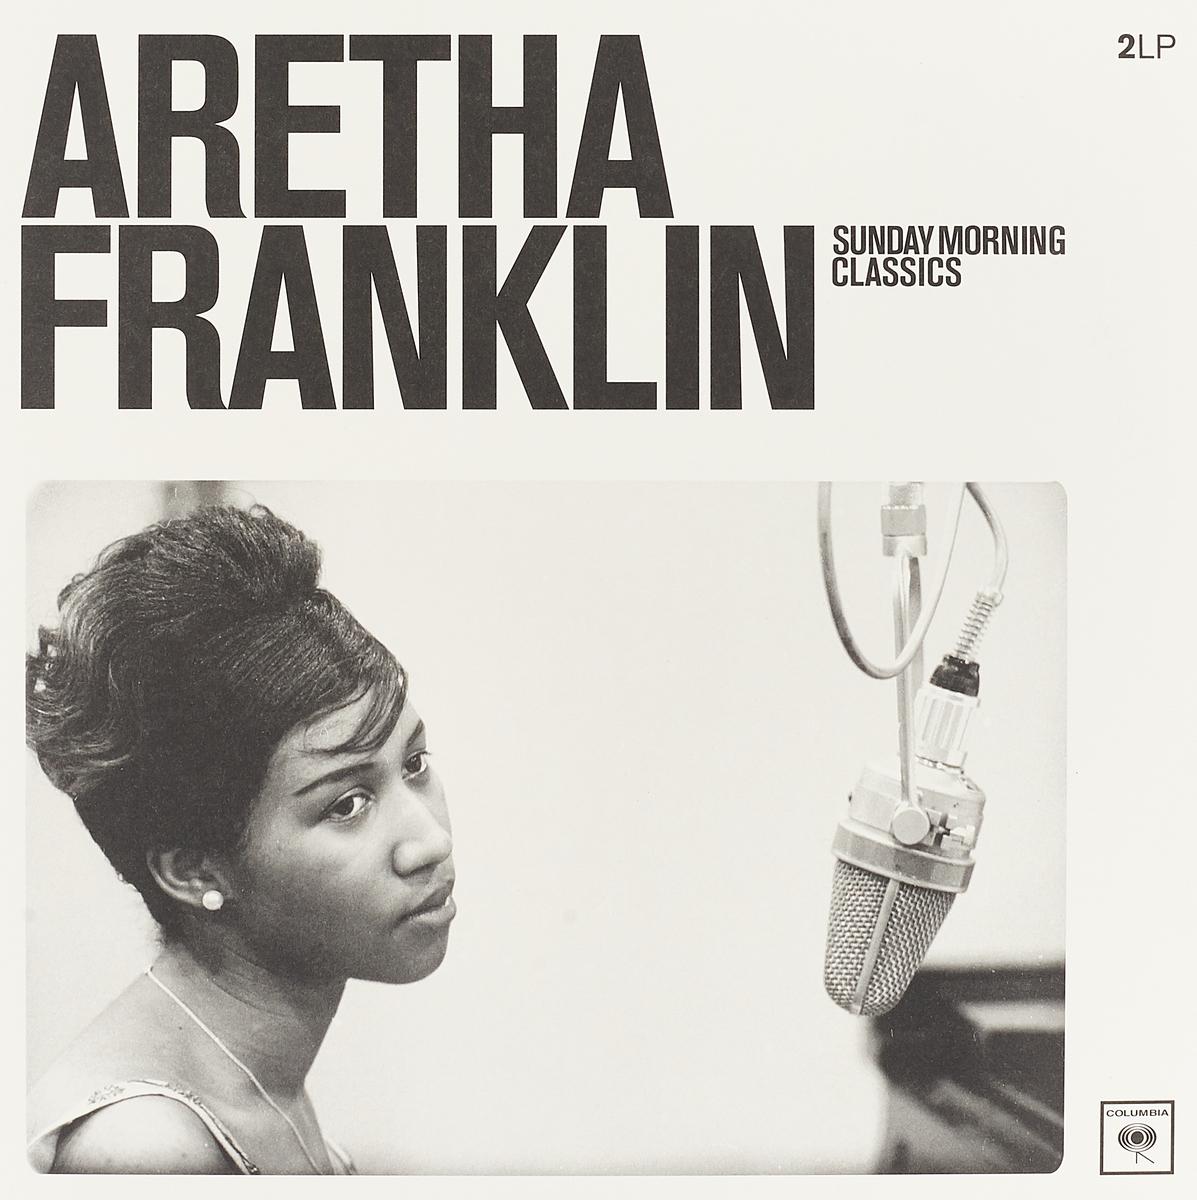 Арета Фрэнклин Aretha Franklin. Sunday Morning Classics (2 LP) арета фрэнклин aretha franklin amazing grace 2 lp